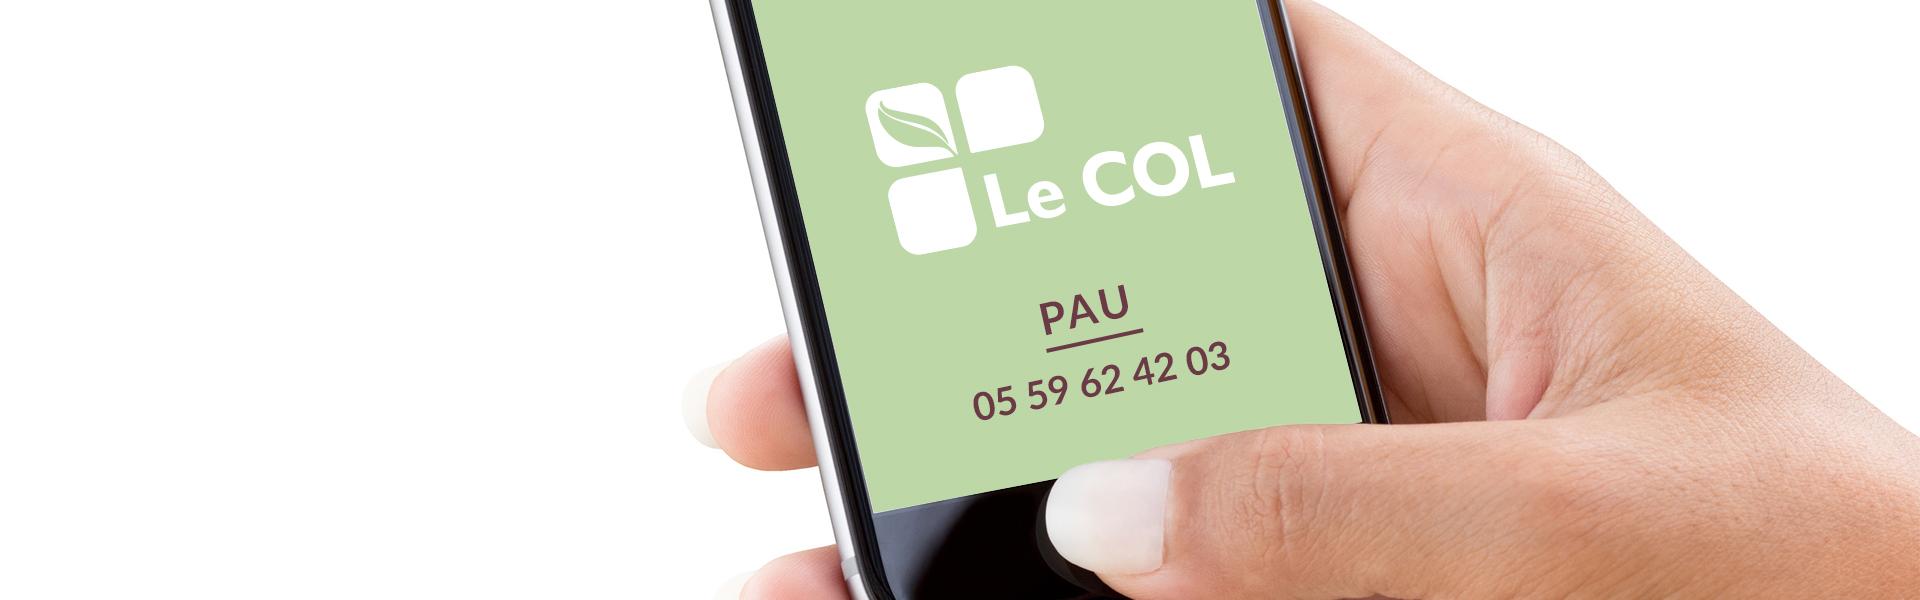 Le-col-bandeau-page-contact-pau